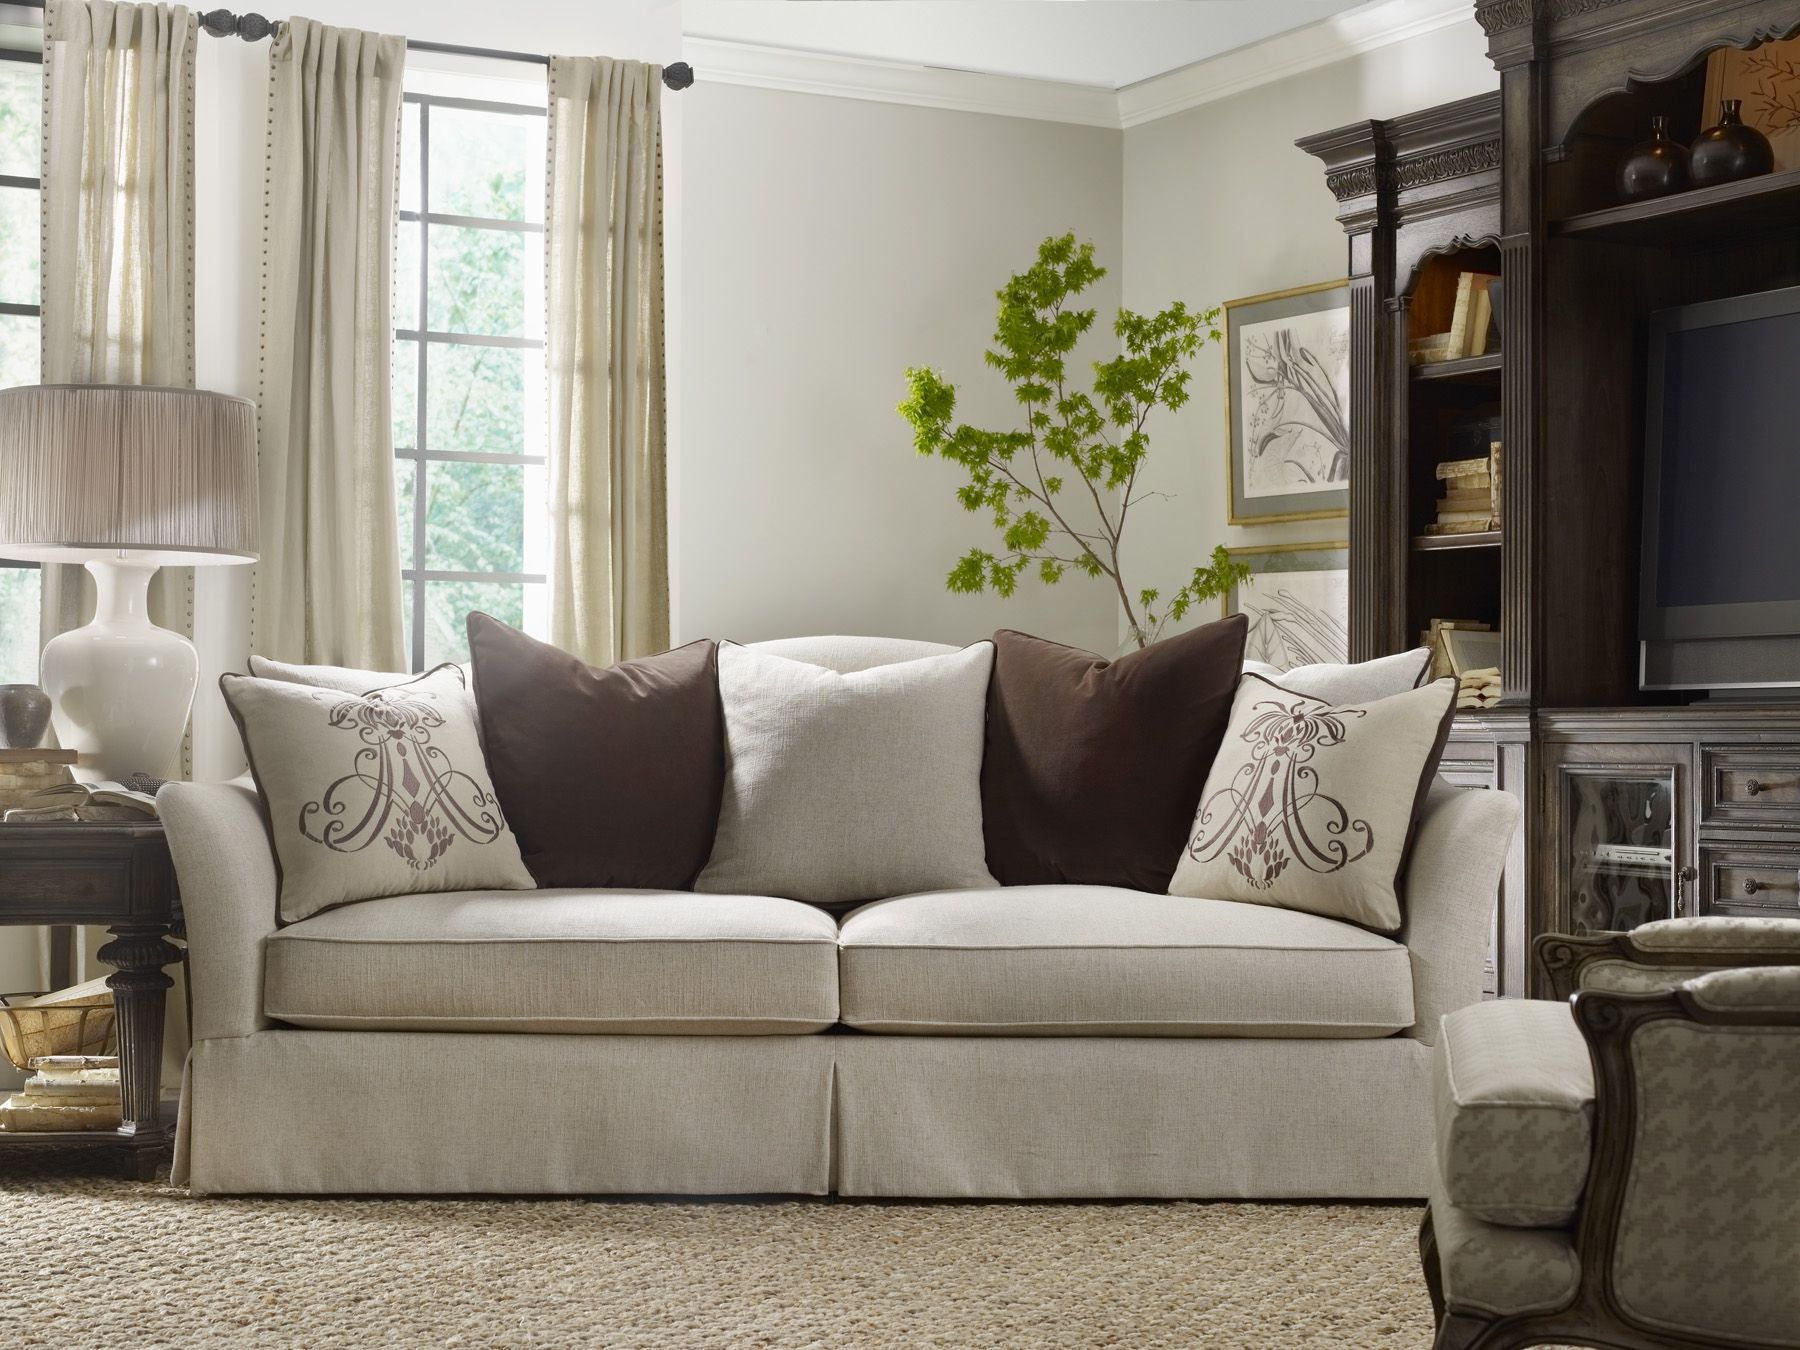 Rhapsody sofa Wish list Pinterest